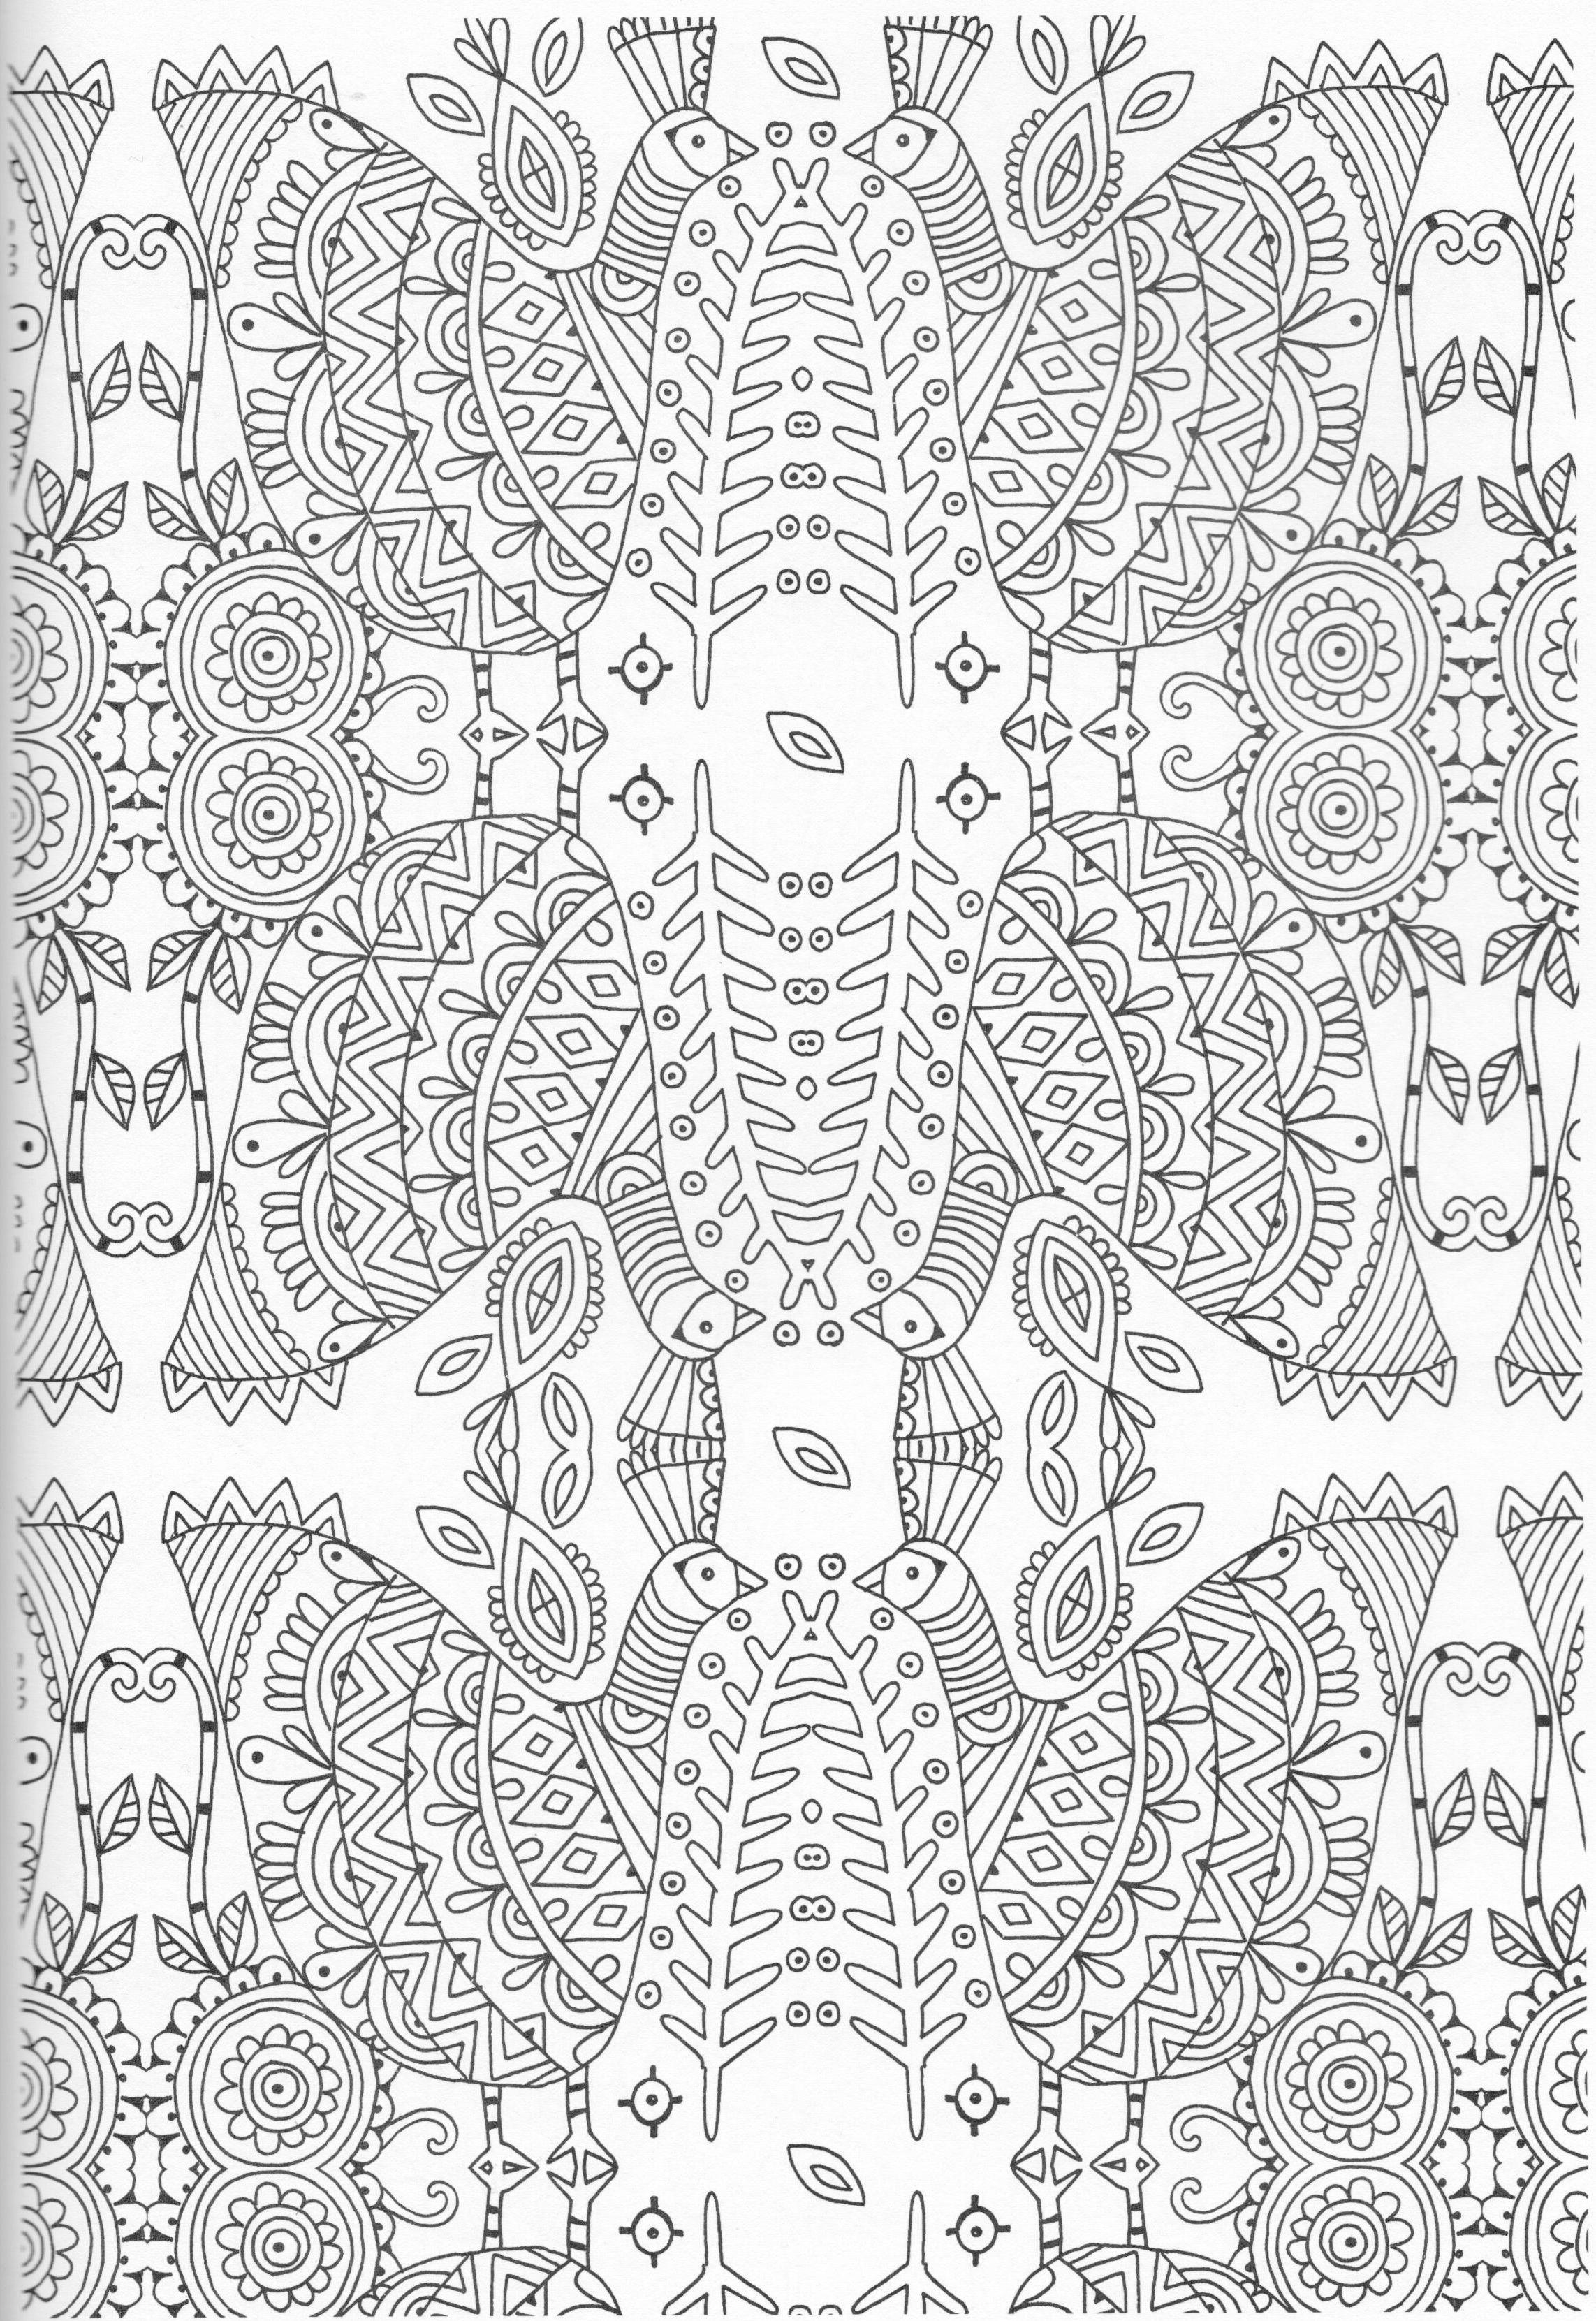 Scandinavian Coloring Book Pg 30 | ÇİZİMLER | Pinterest | Mandalas ...